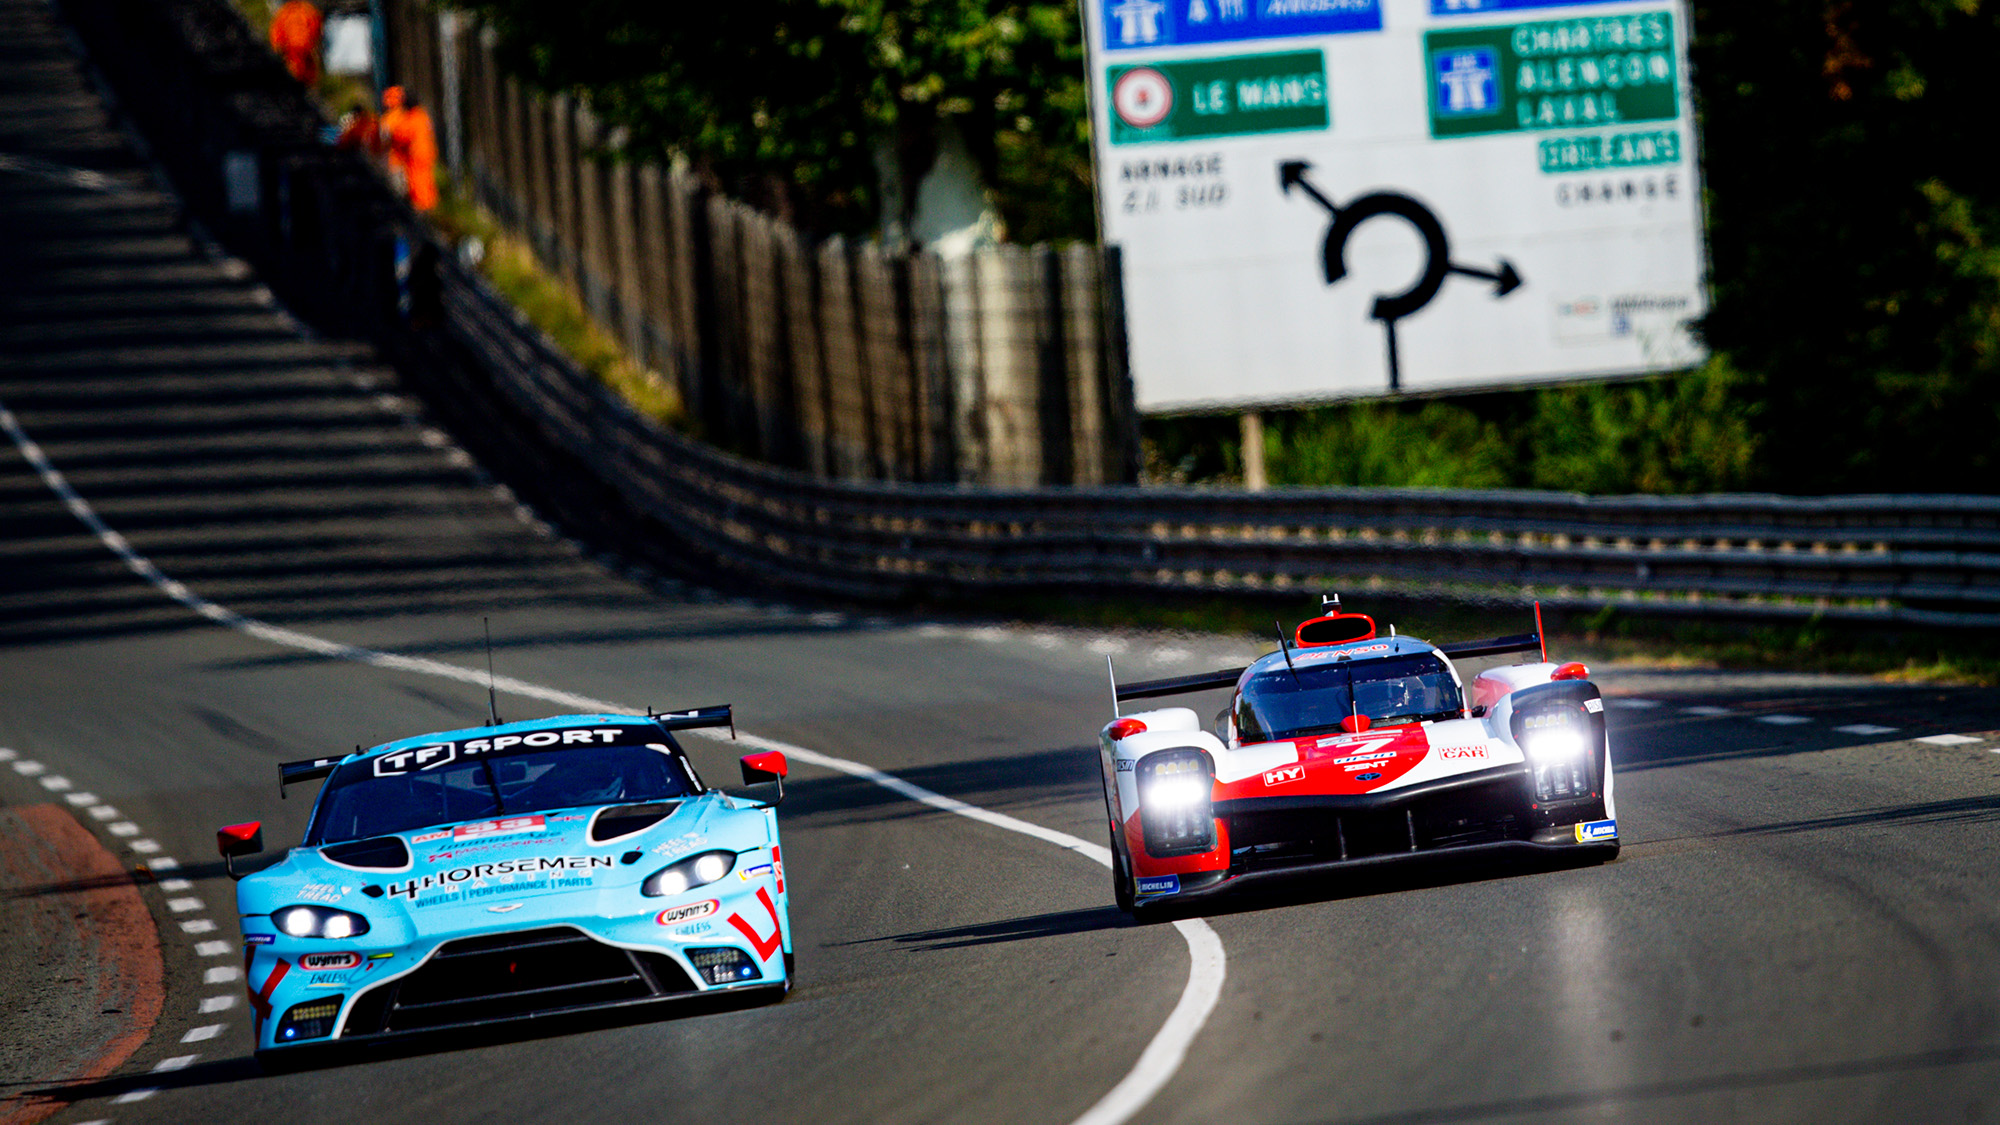 Toyota Hypercar and Aston Martin at Le Mans 2021